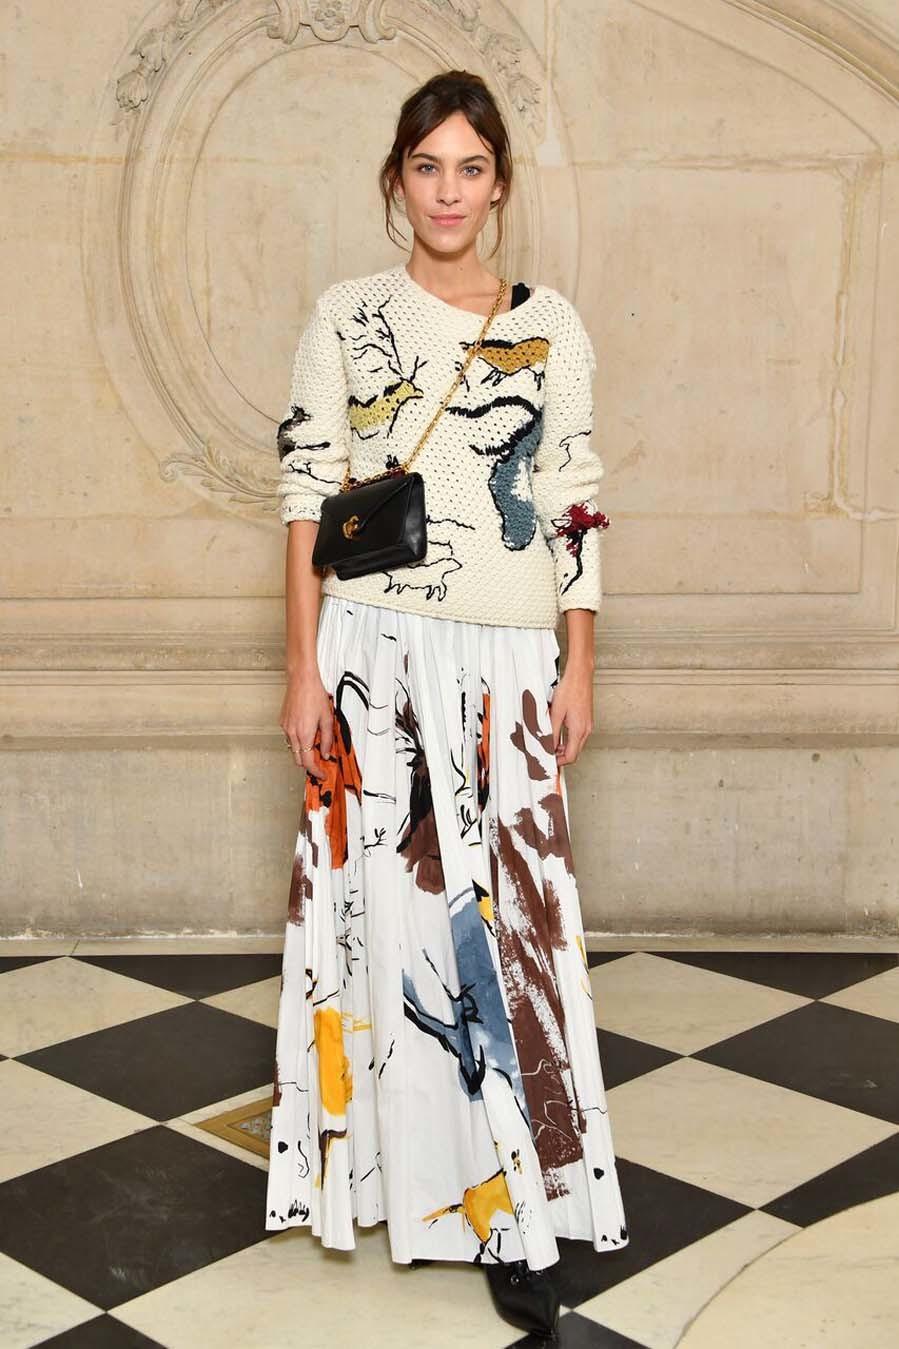 Alexa Chung en el photocall de Dior